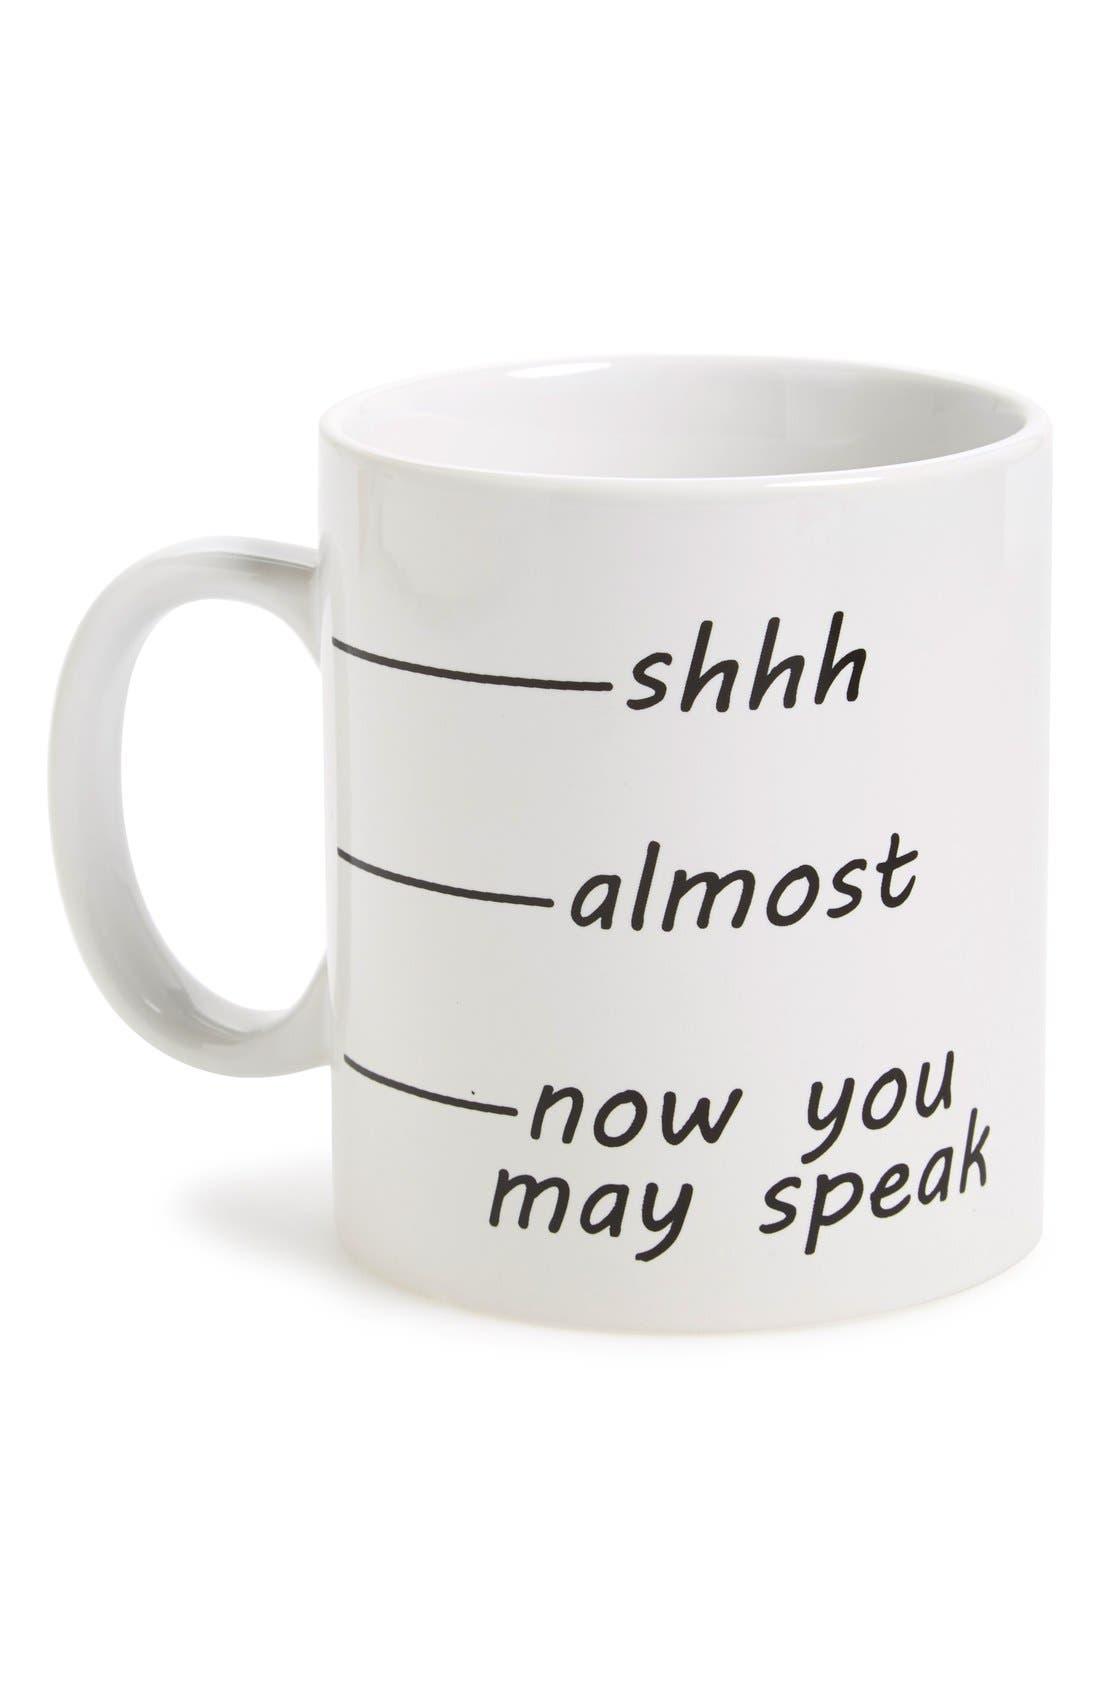 Alternate Image 1 Selected - Barbuzzo 'Shhh' Ceramic Mug